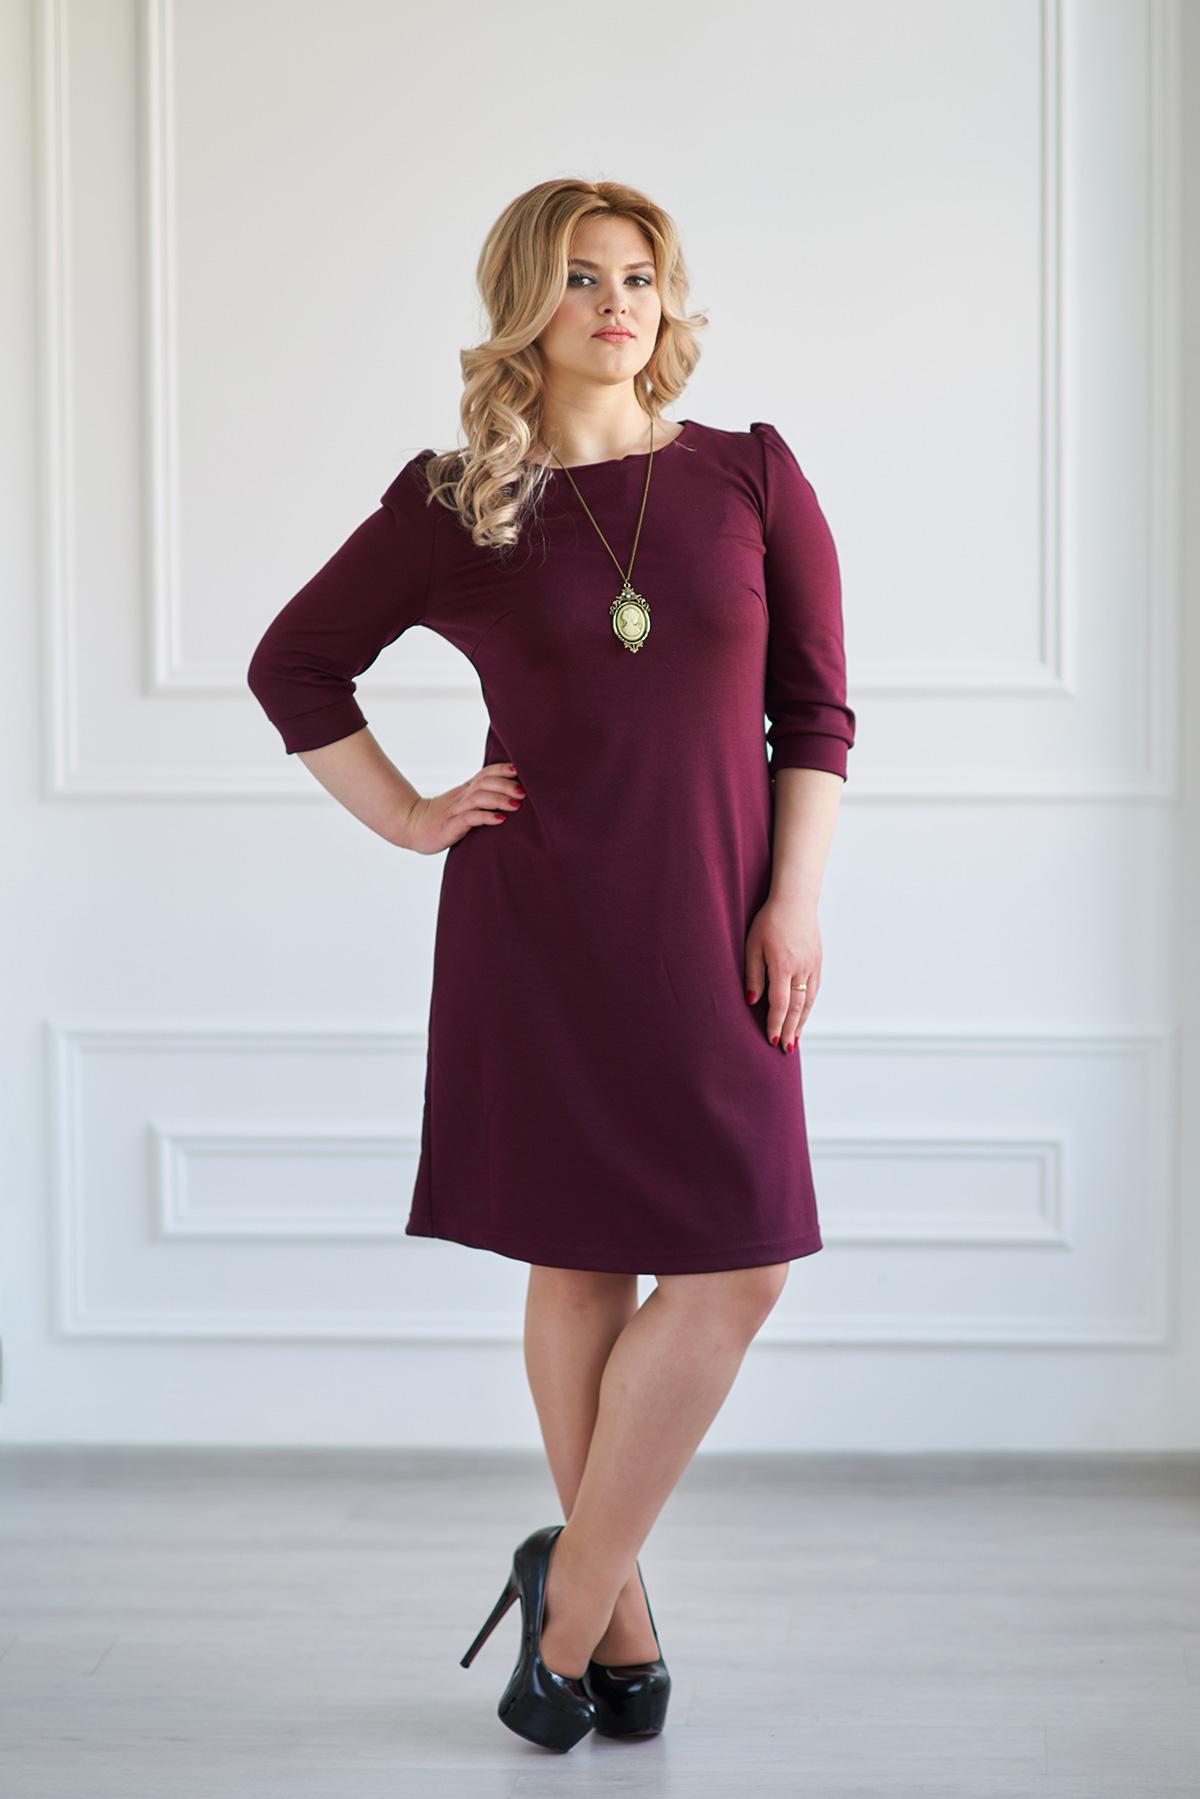 Жен. платье Модное Бордо р. 44Платья<br>Факт. ОГ: 86 см <br>Факт. ОТ: 82 см <br>Факт. ОБ: 94 см <br>Длина по спинке: 88 см<br><br>Тип: Жен. платье<br>Размер: 44<br>Материал: Милано